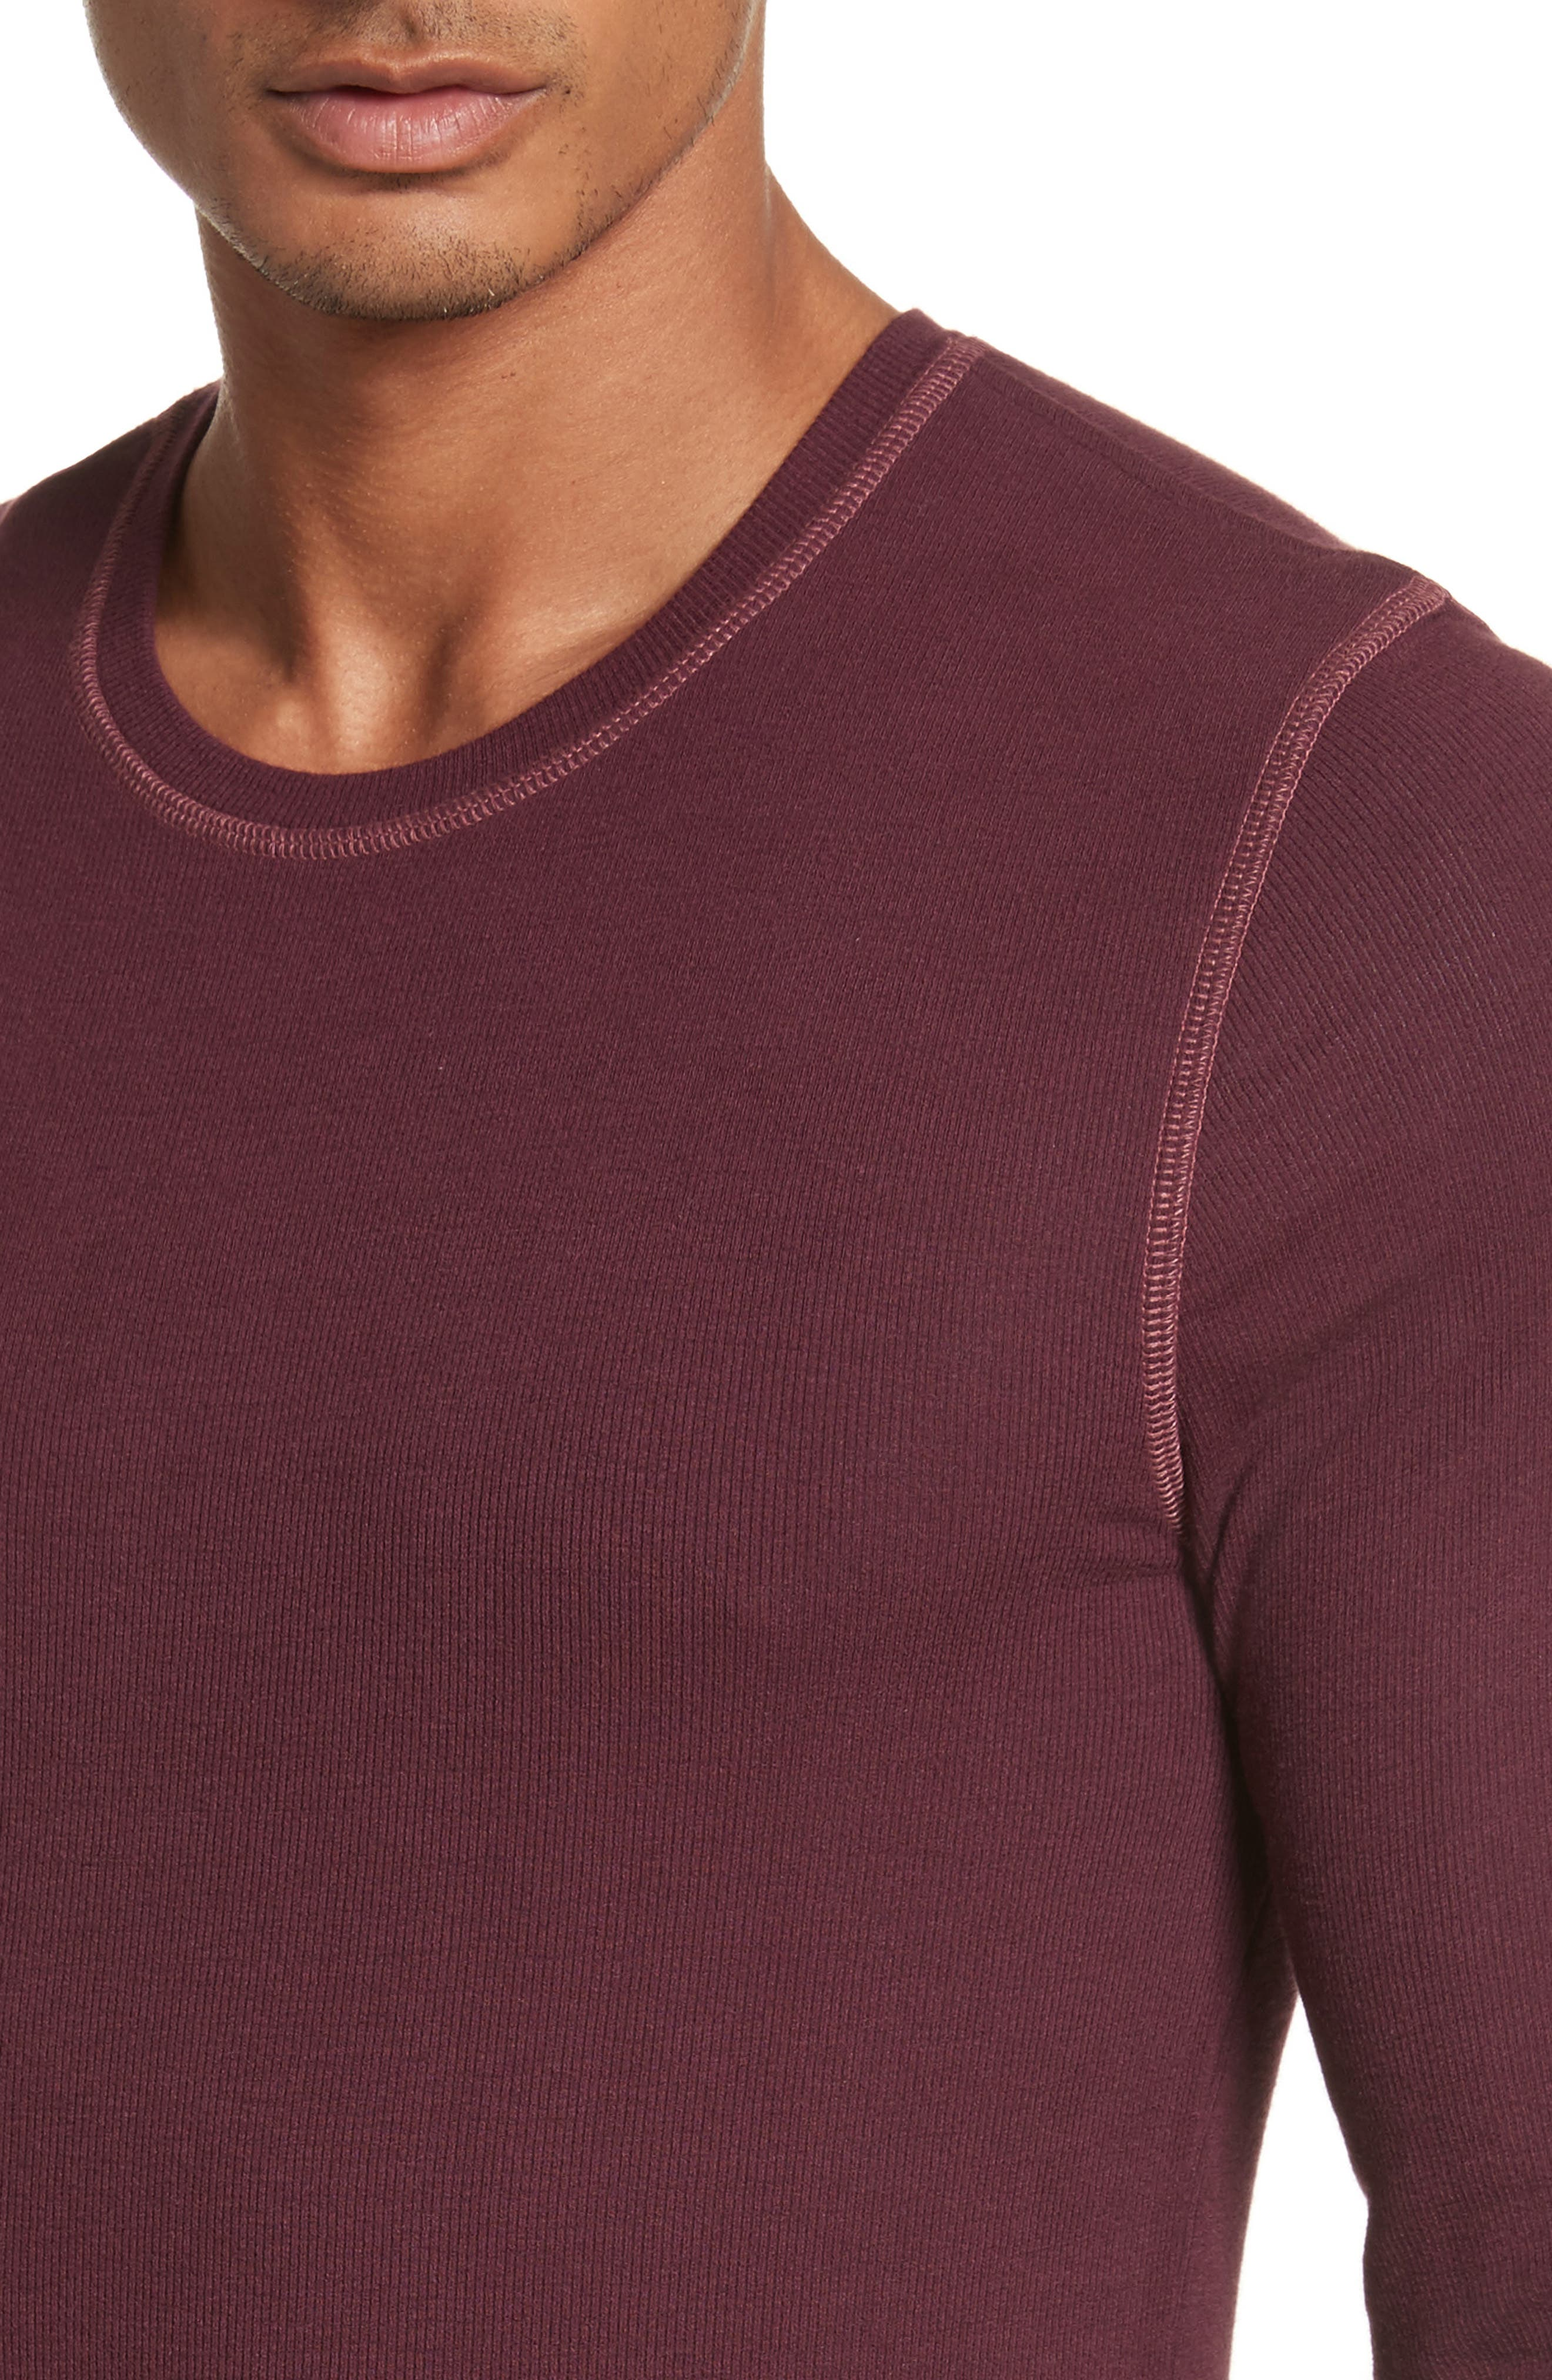 Rib Modal Crewneck Sweater,                             Alternate thumbnail 8, color,